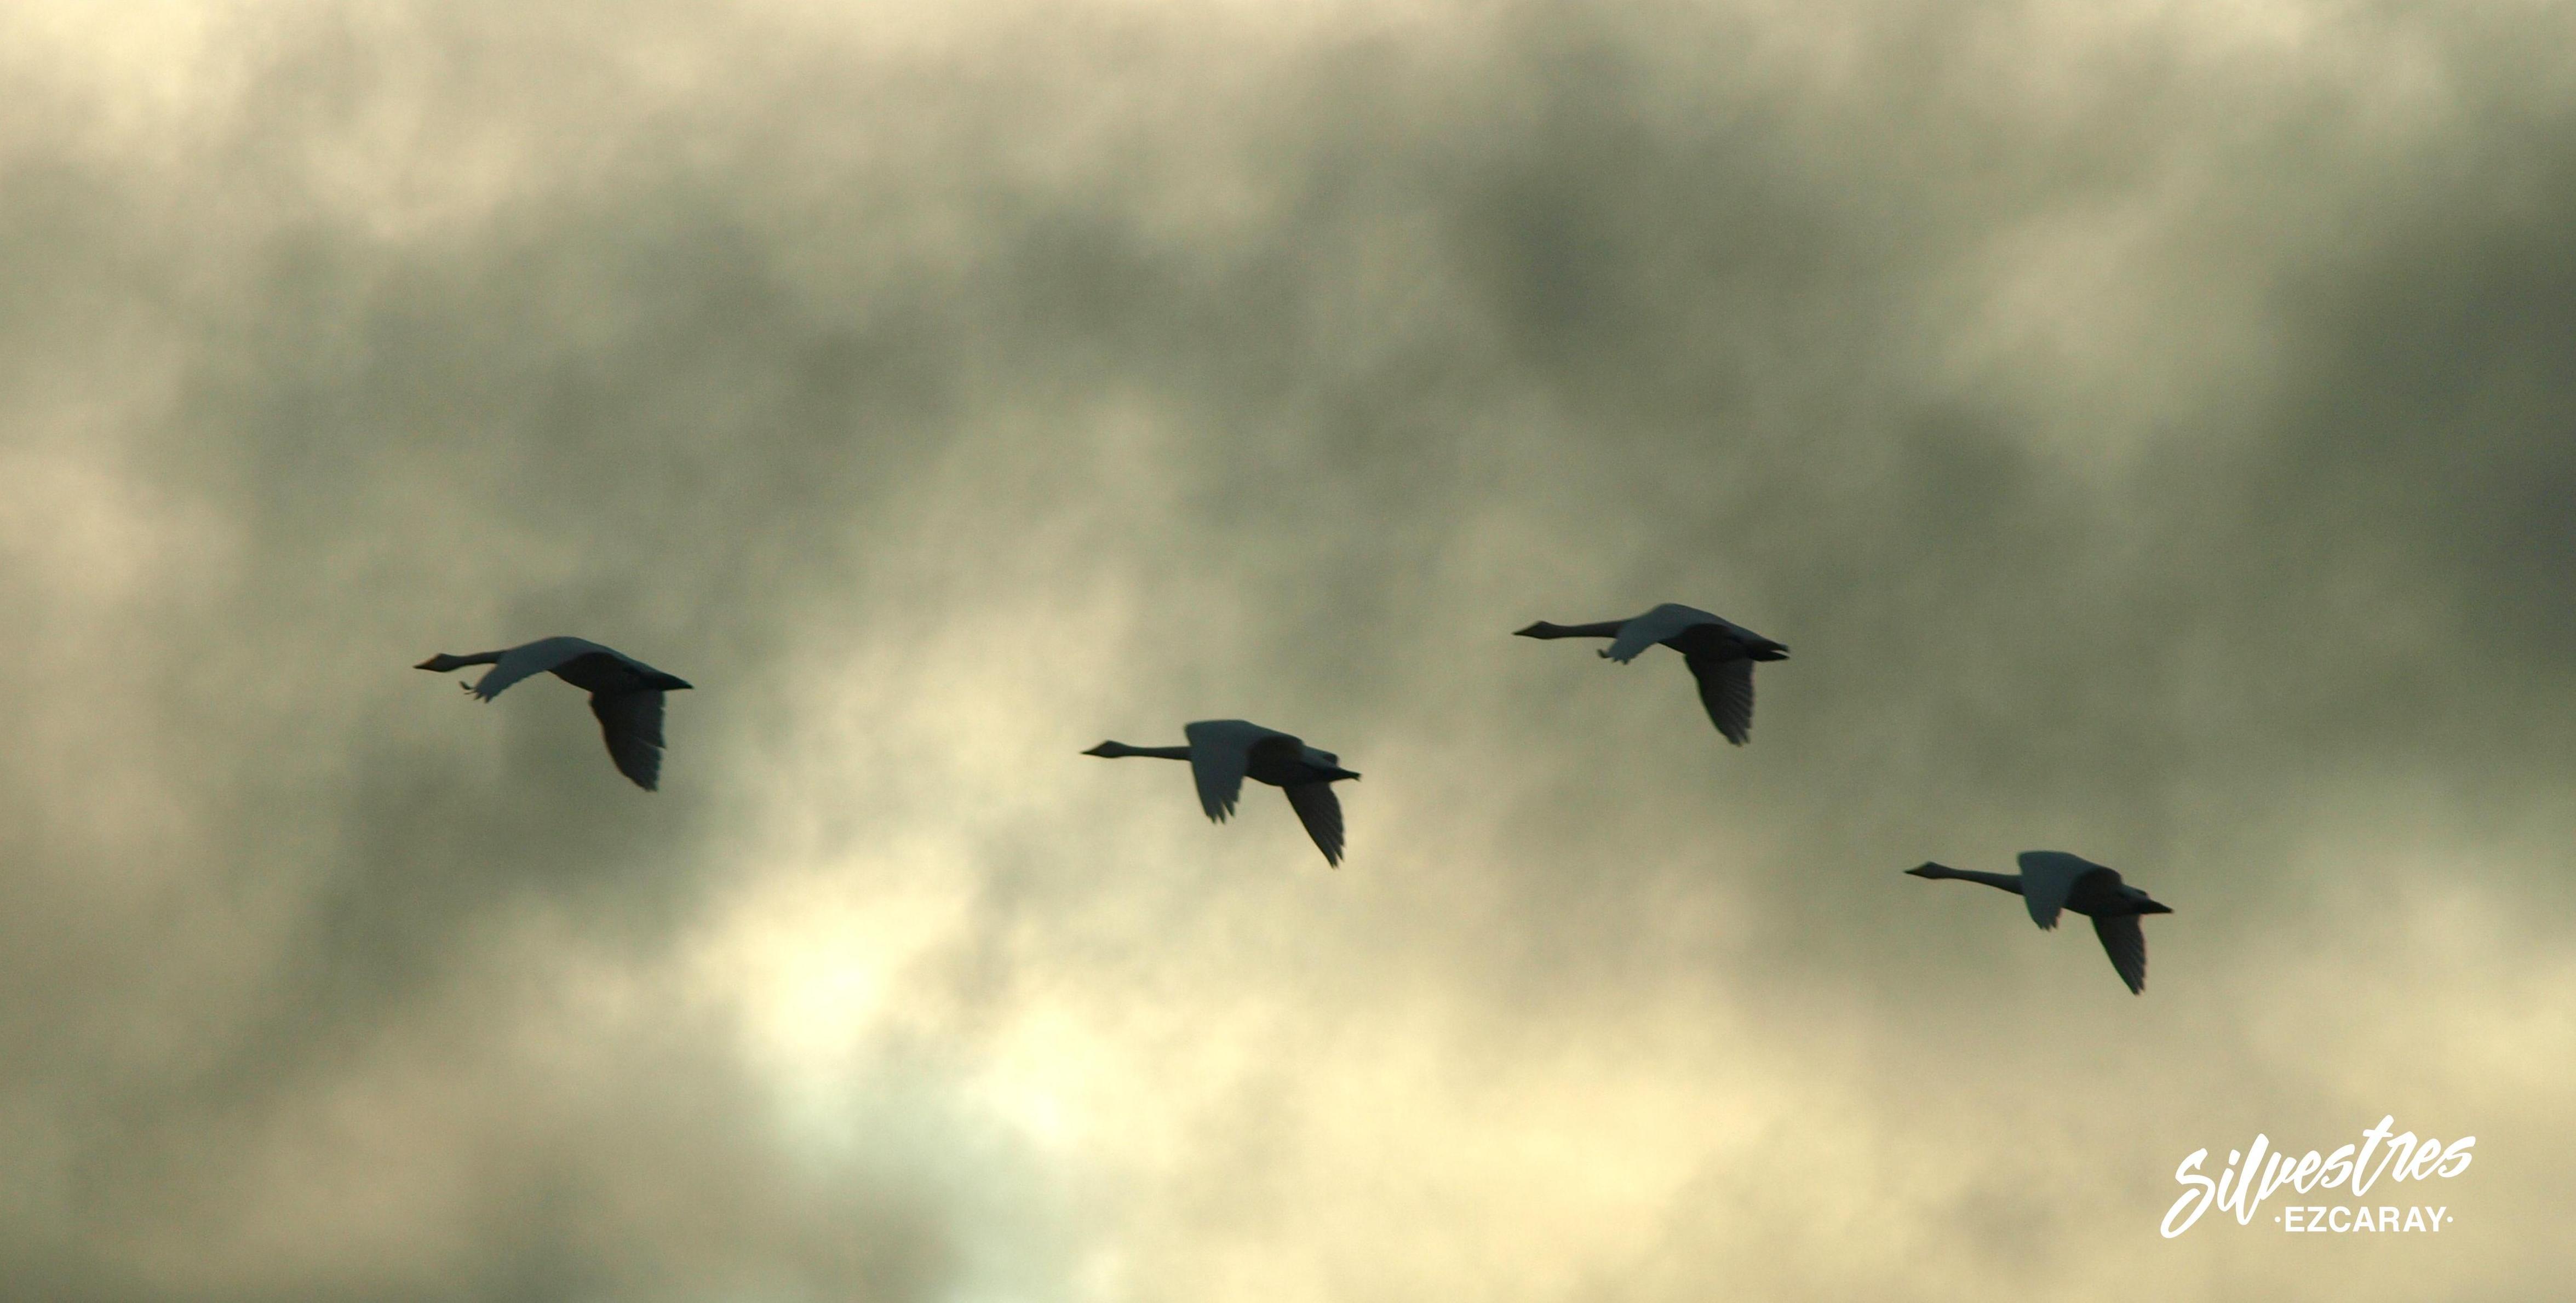 cisne_cantor_islandia_observación_aves_birdwatching_iceland_cygnus